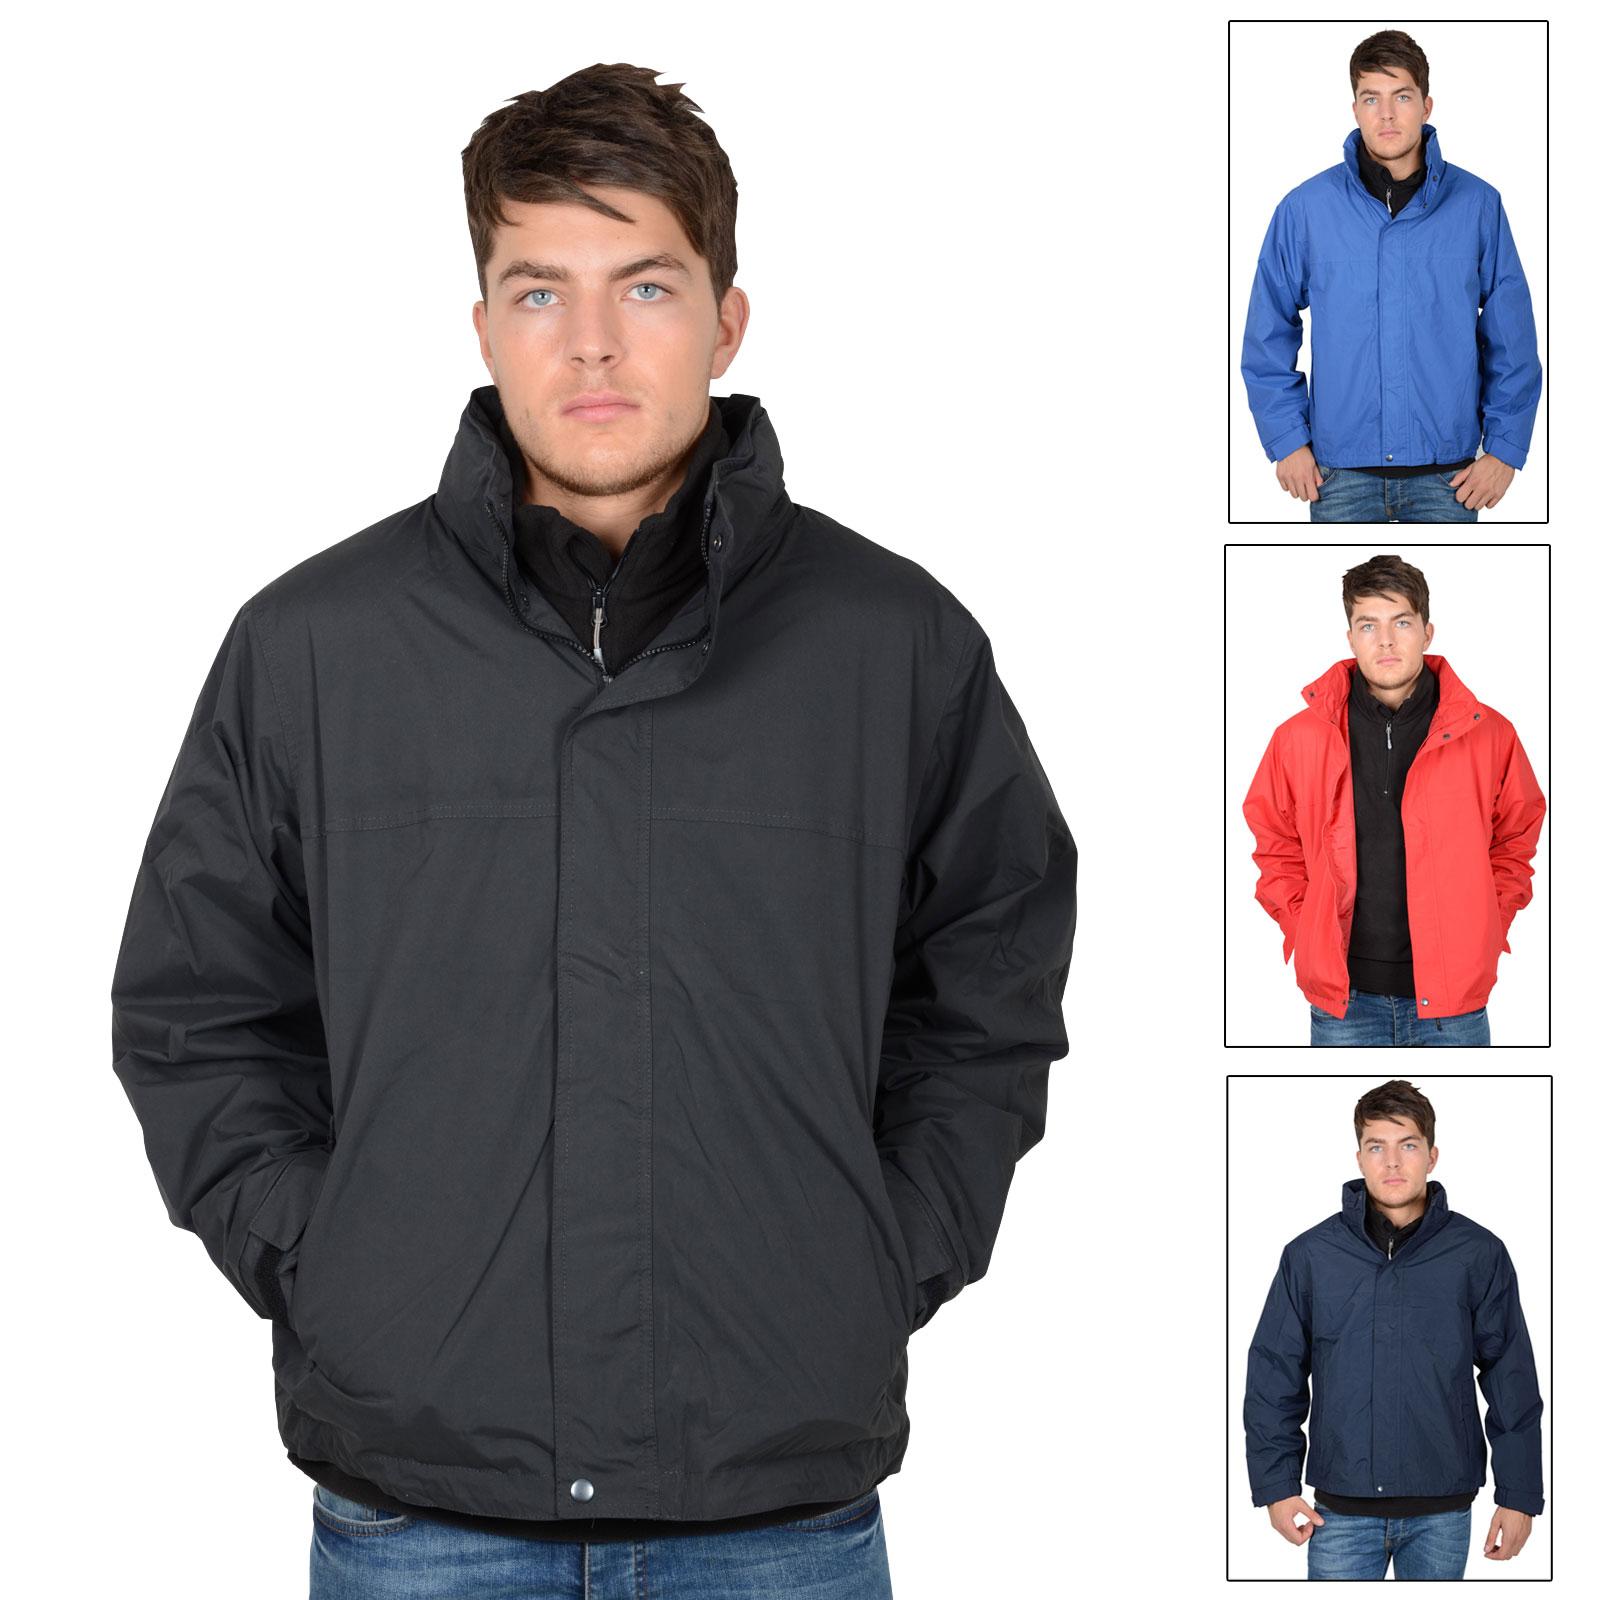 Mens regatta jacket - Regatta Pace Mens Outdoor Waterproof Windproof Workwear Jacket